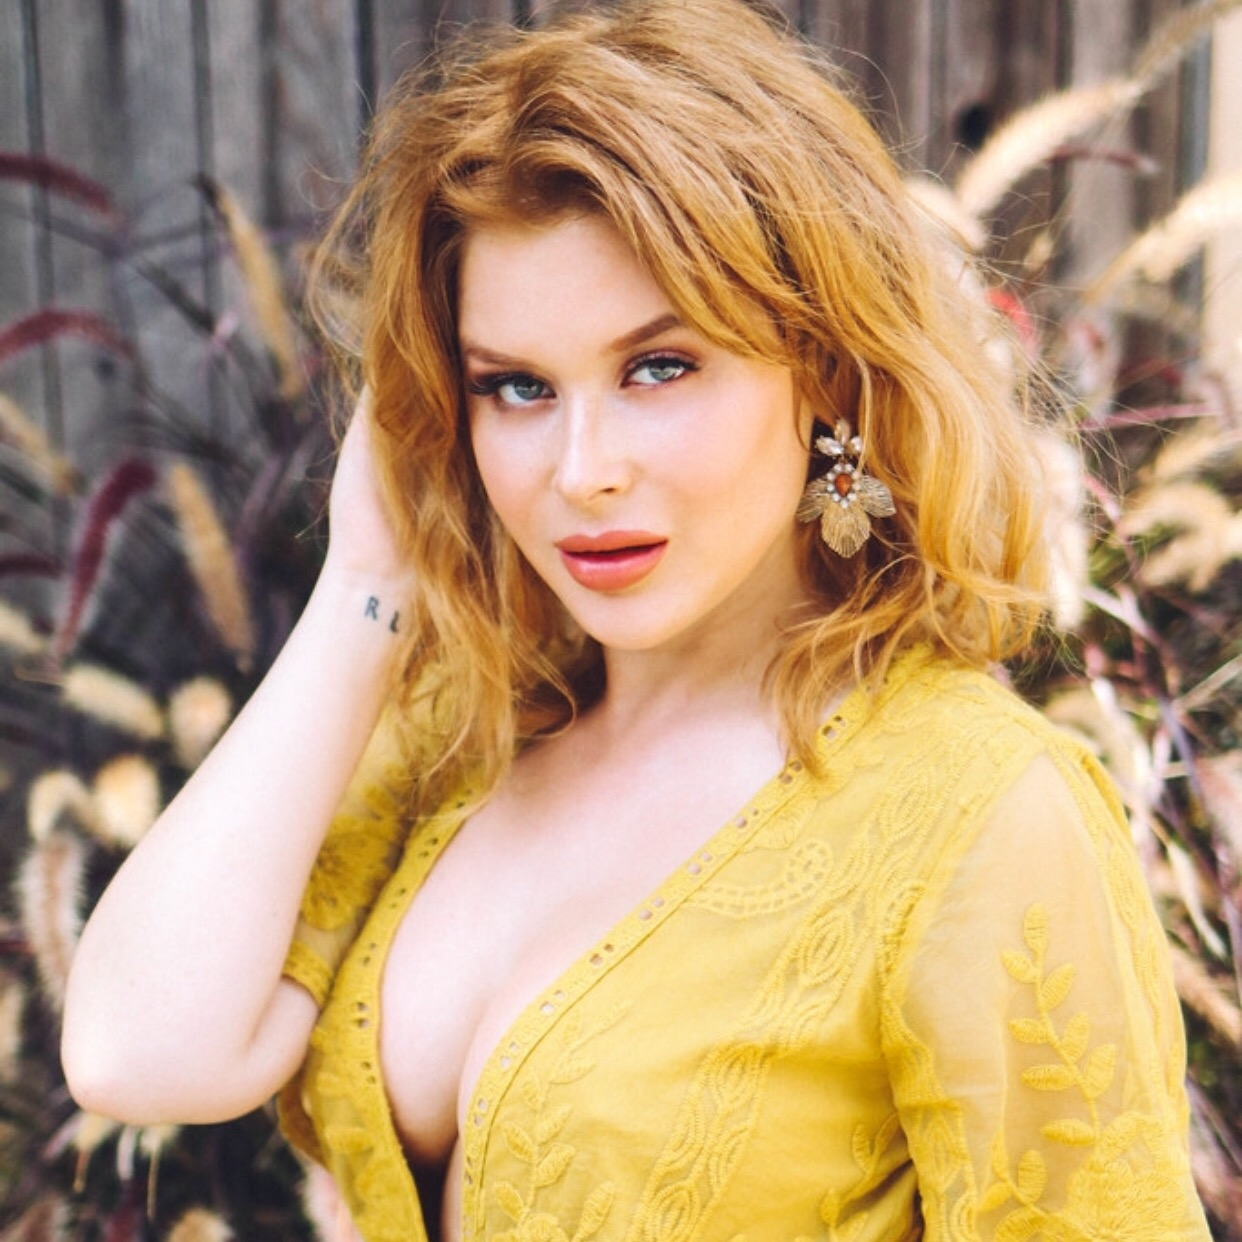 Images Renee Olstead nude photos 2019